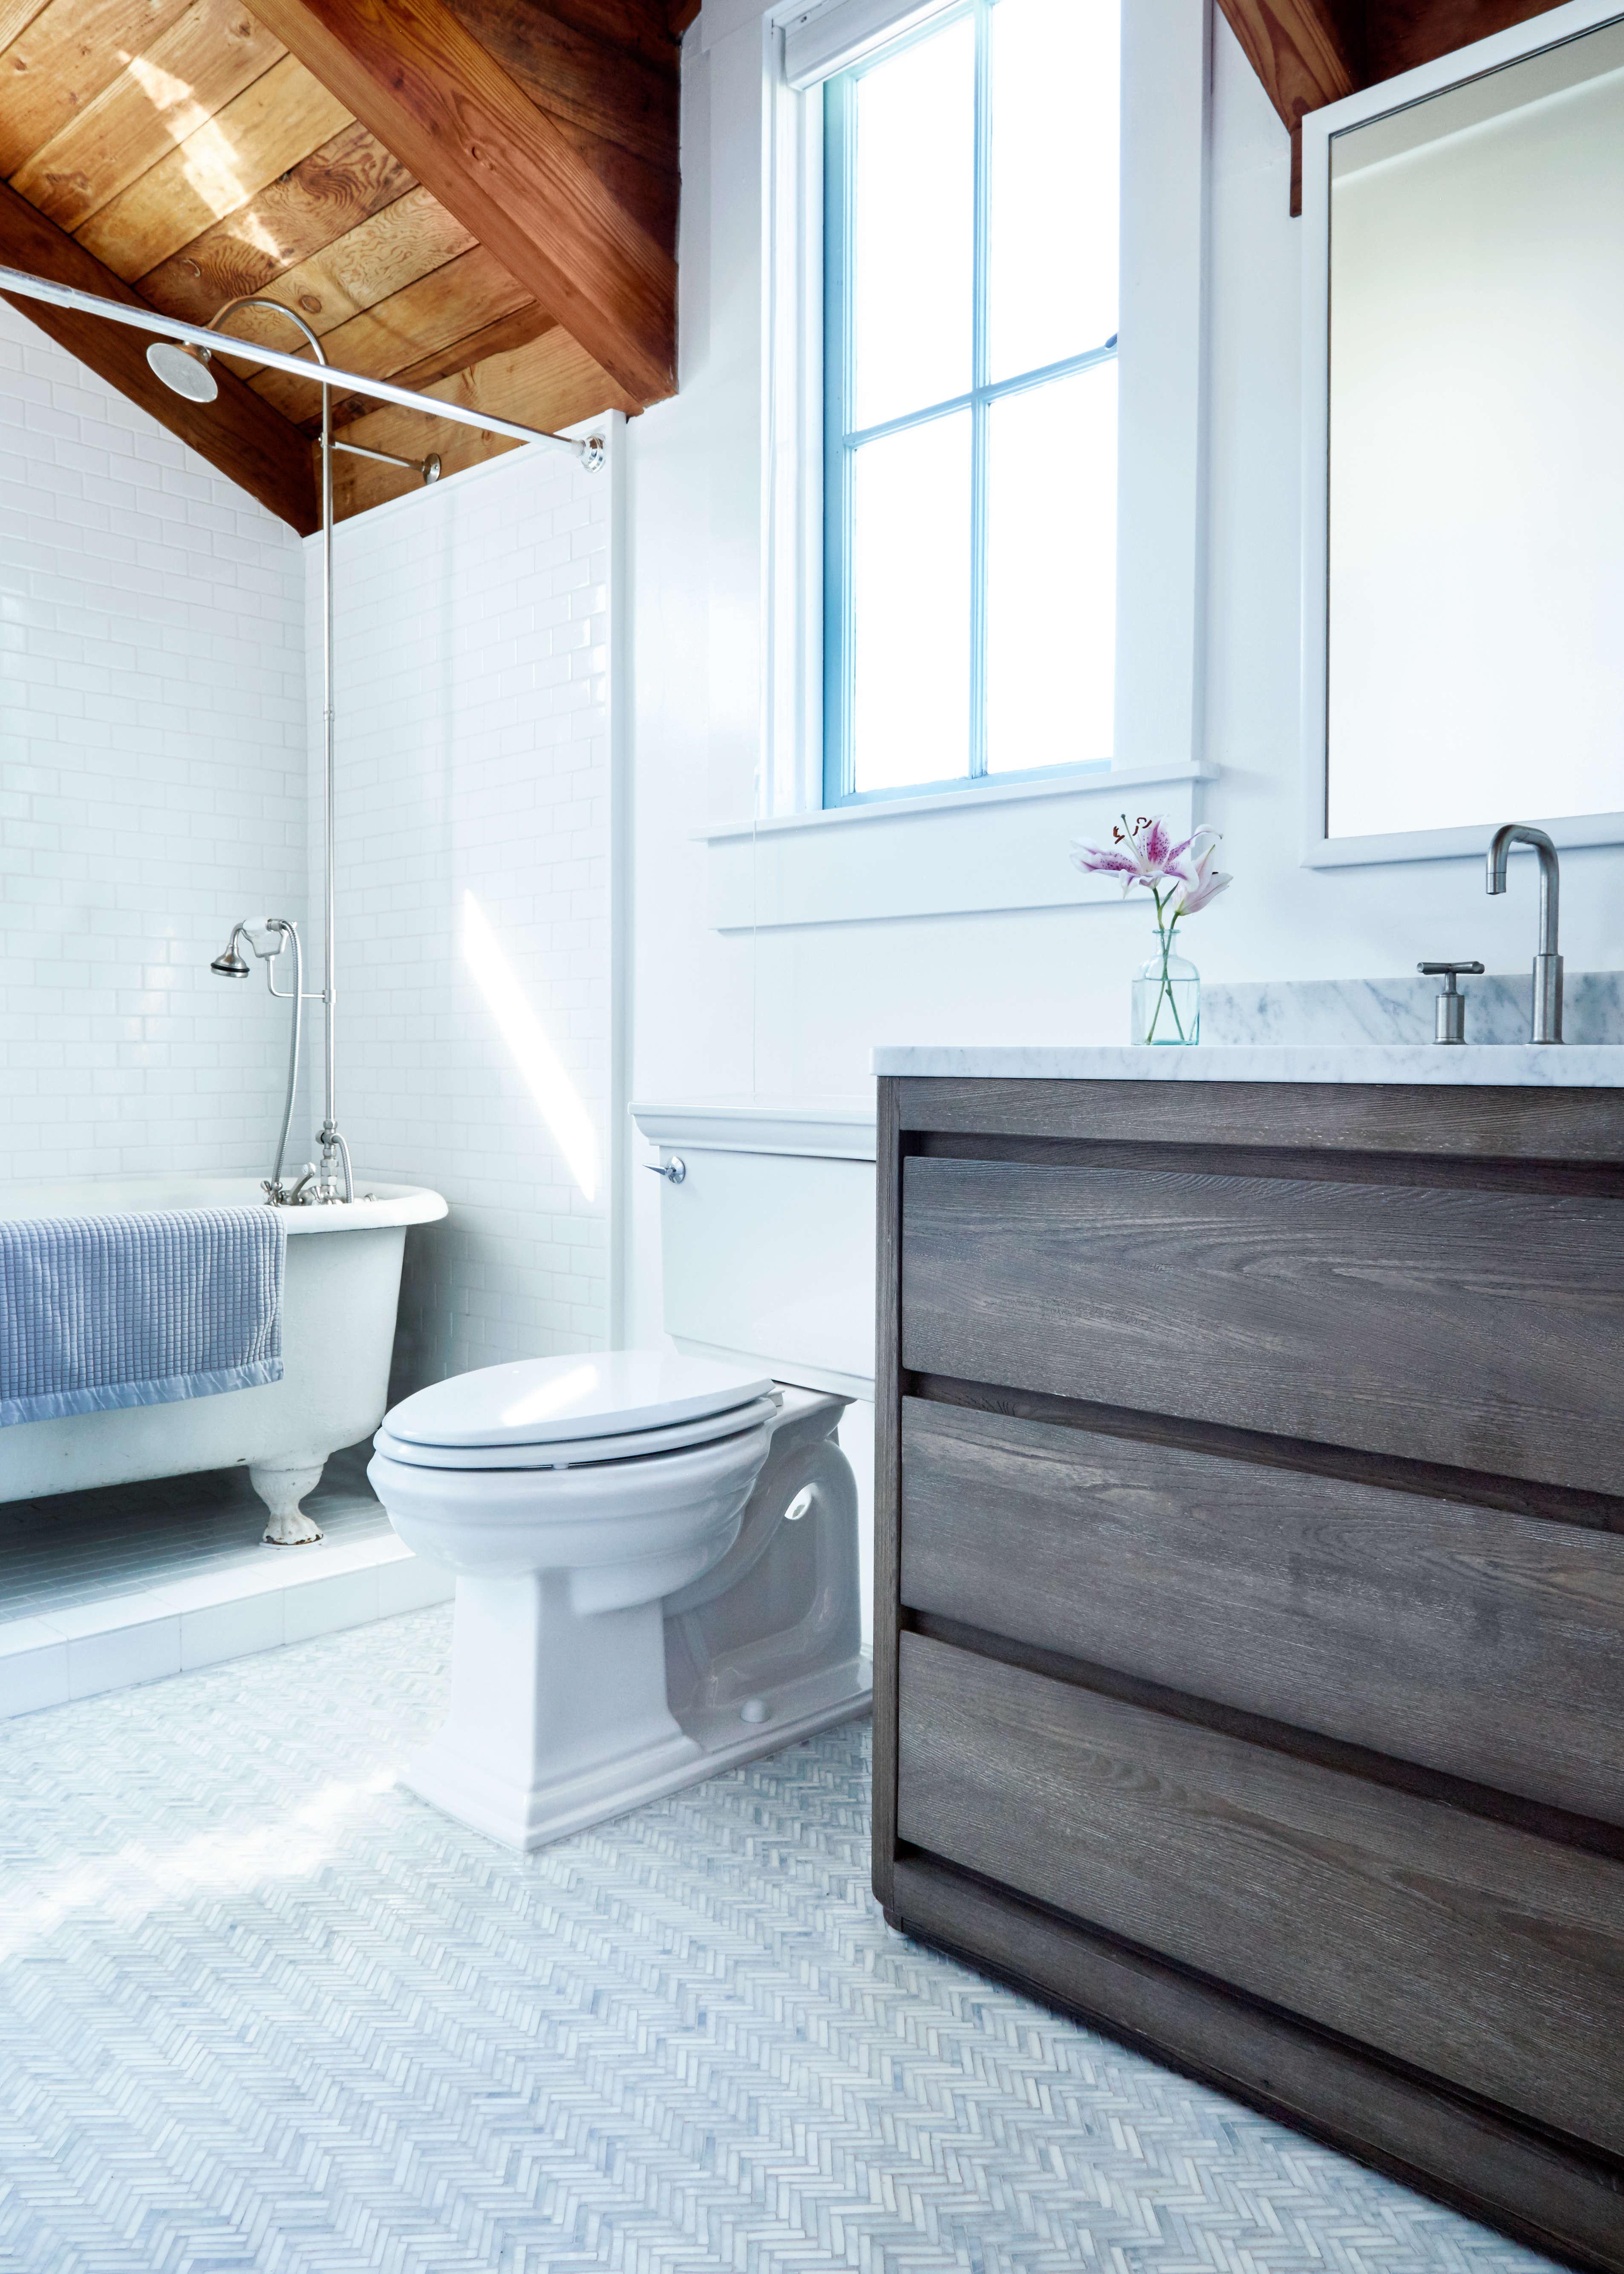 Mosaic floor tiles bathroom - Bathroom Glass Mosaic Floor By Sarah Myers Aya